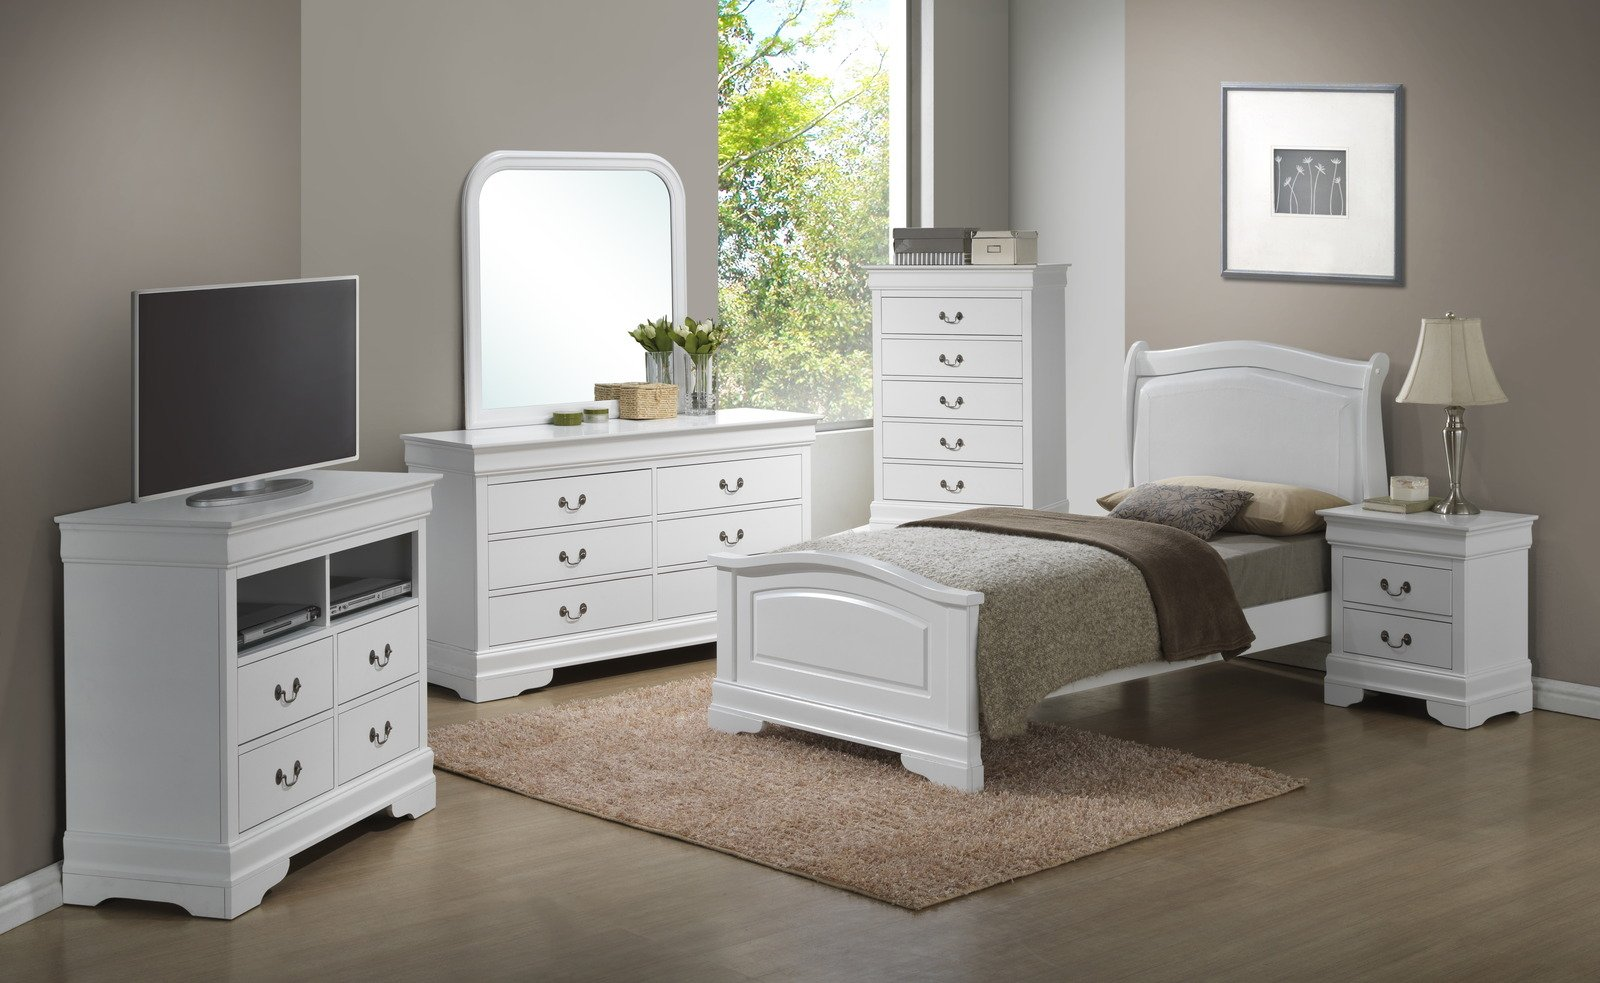 Glory Furniture G3190 Low Profile Bedroom Set w/ PU Insert ...